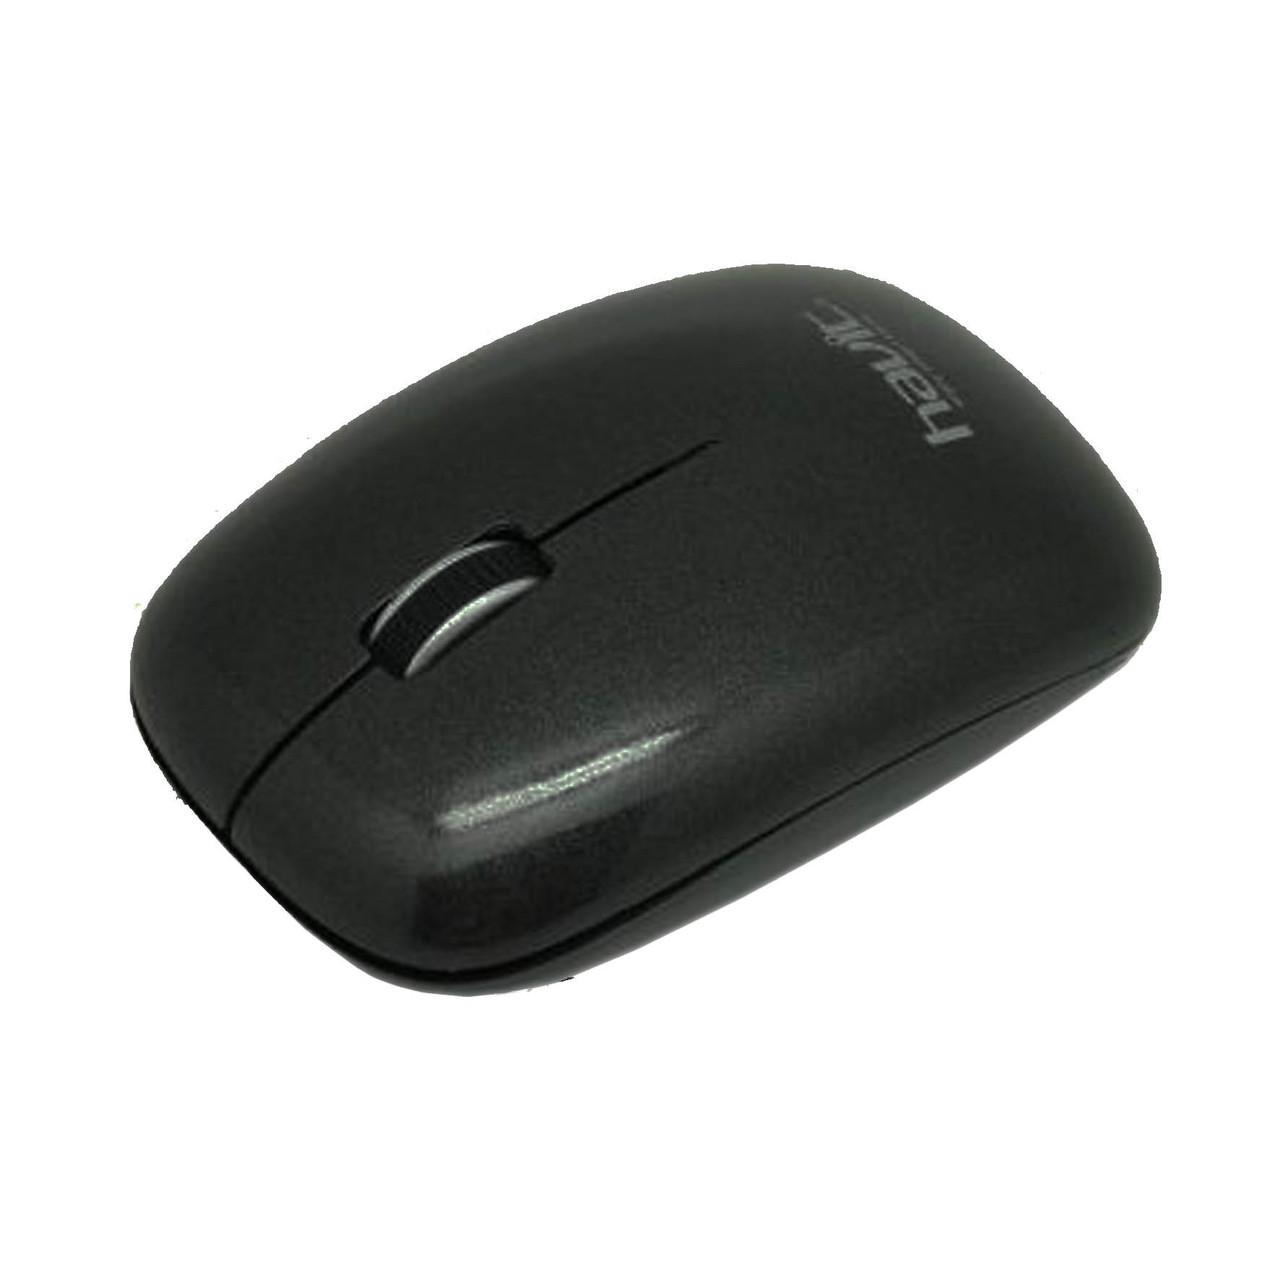 Беспроводная мышка для компьютера mouse HAVIT  HV-MS903GT Wireless USB, black